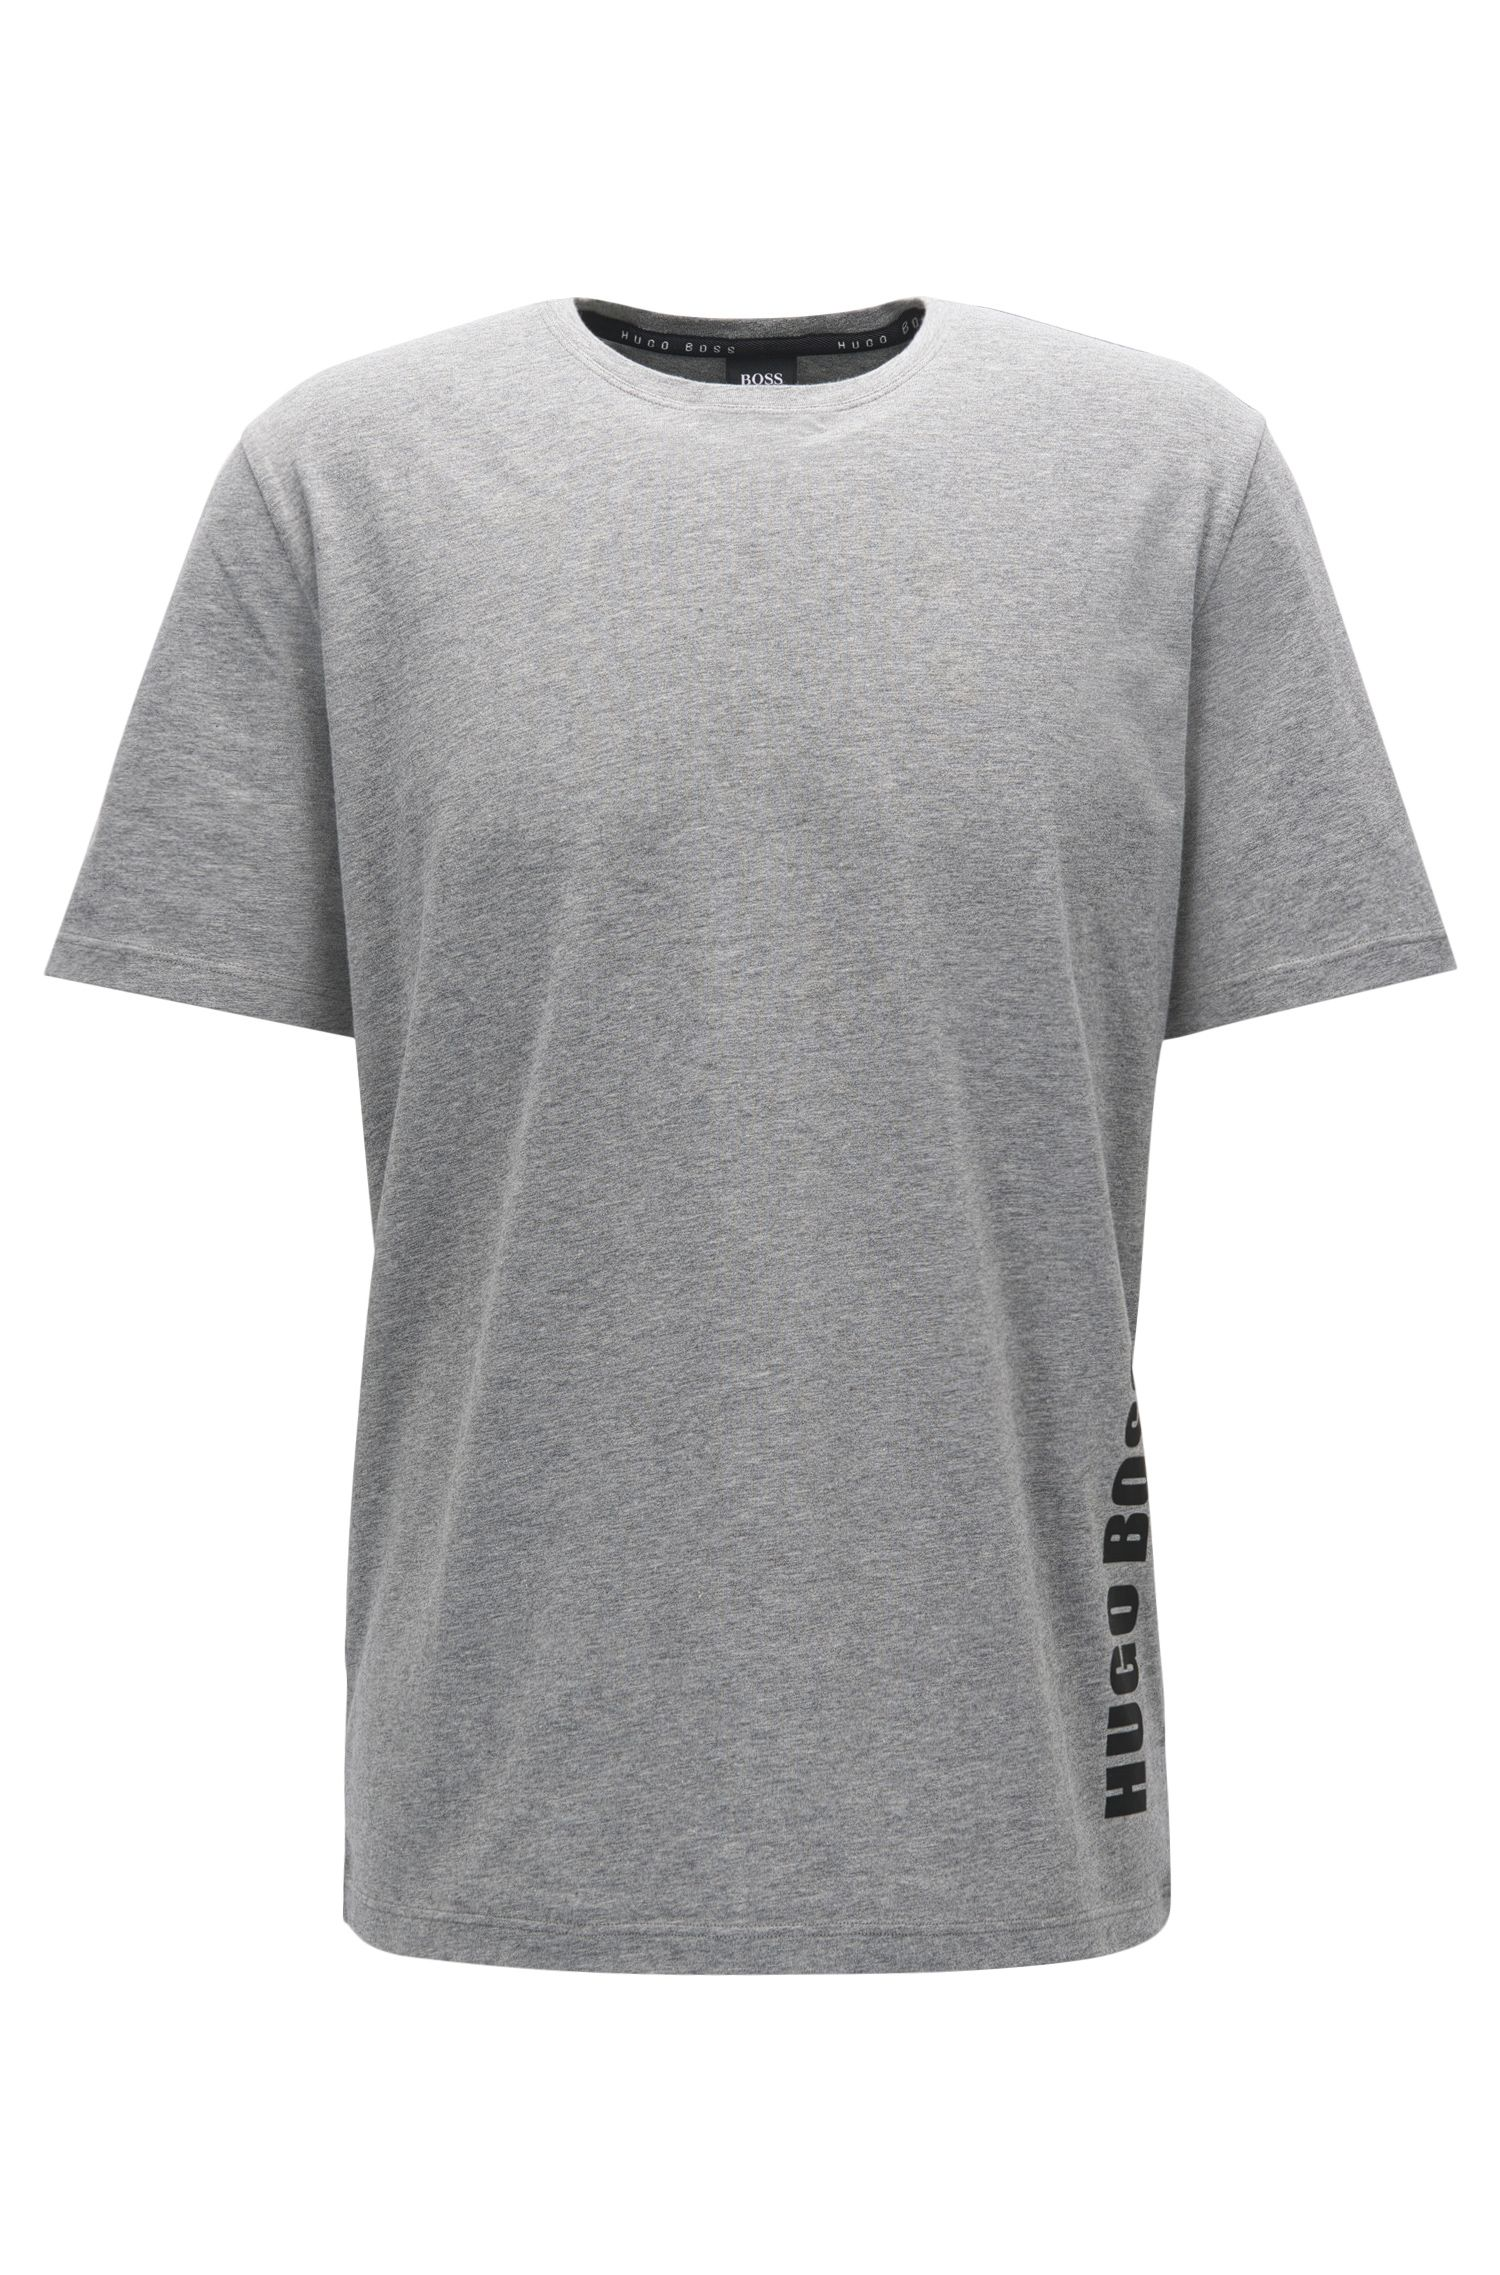 Logo-Print Jersey T-Shirt | Identity T-Shirt RN, Grey